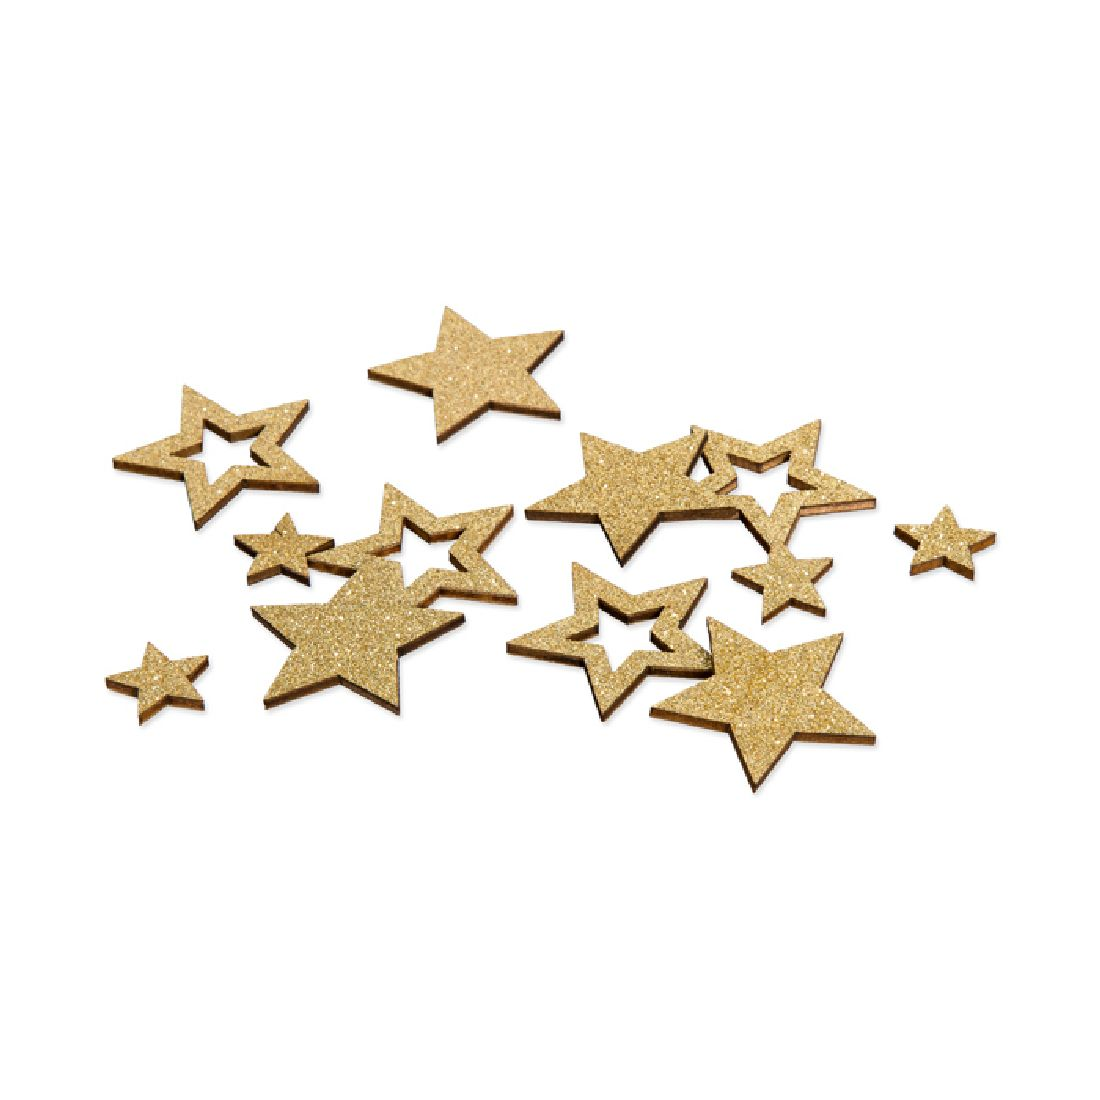 Sternstreu Glitter GOLD-GLIMMER 22707 Holz Ø2cm+Ø4cmx0,3mm  2 Größen Mix